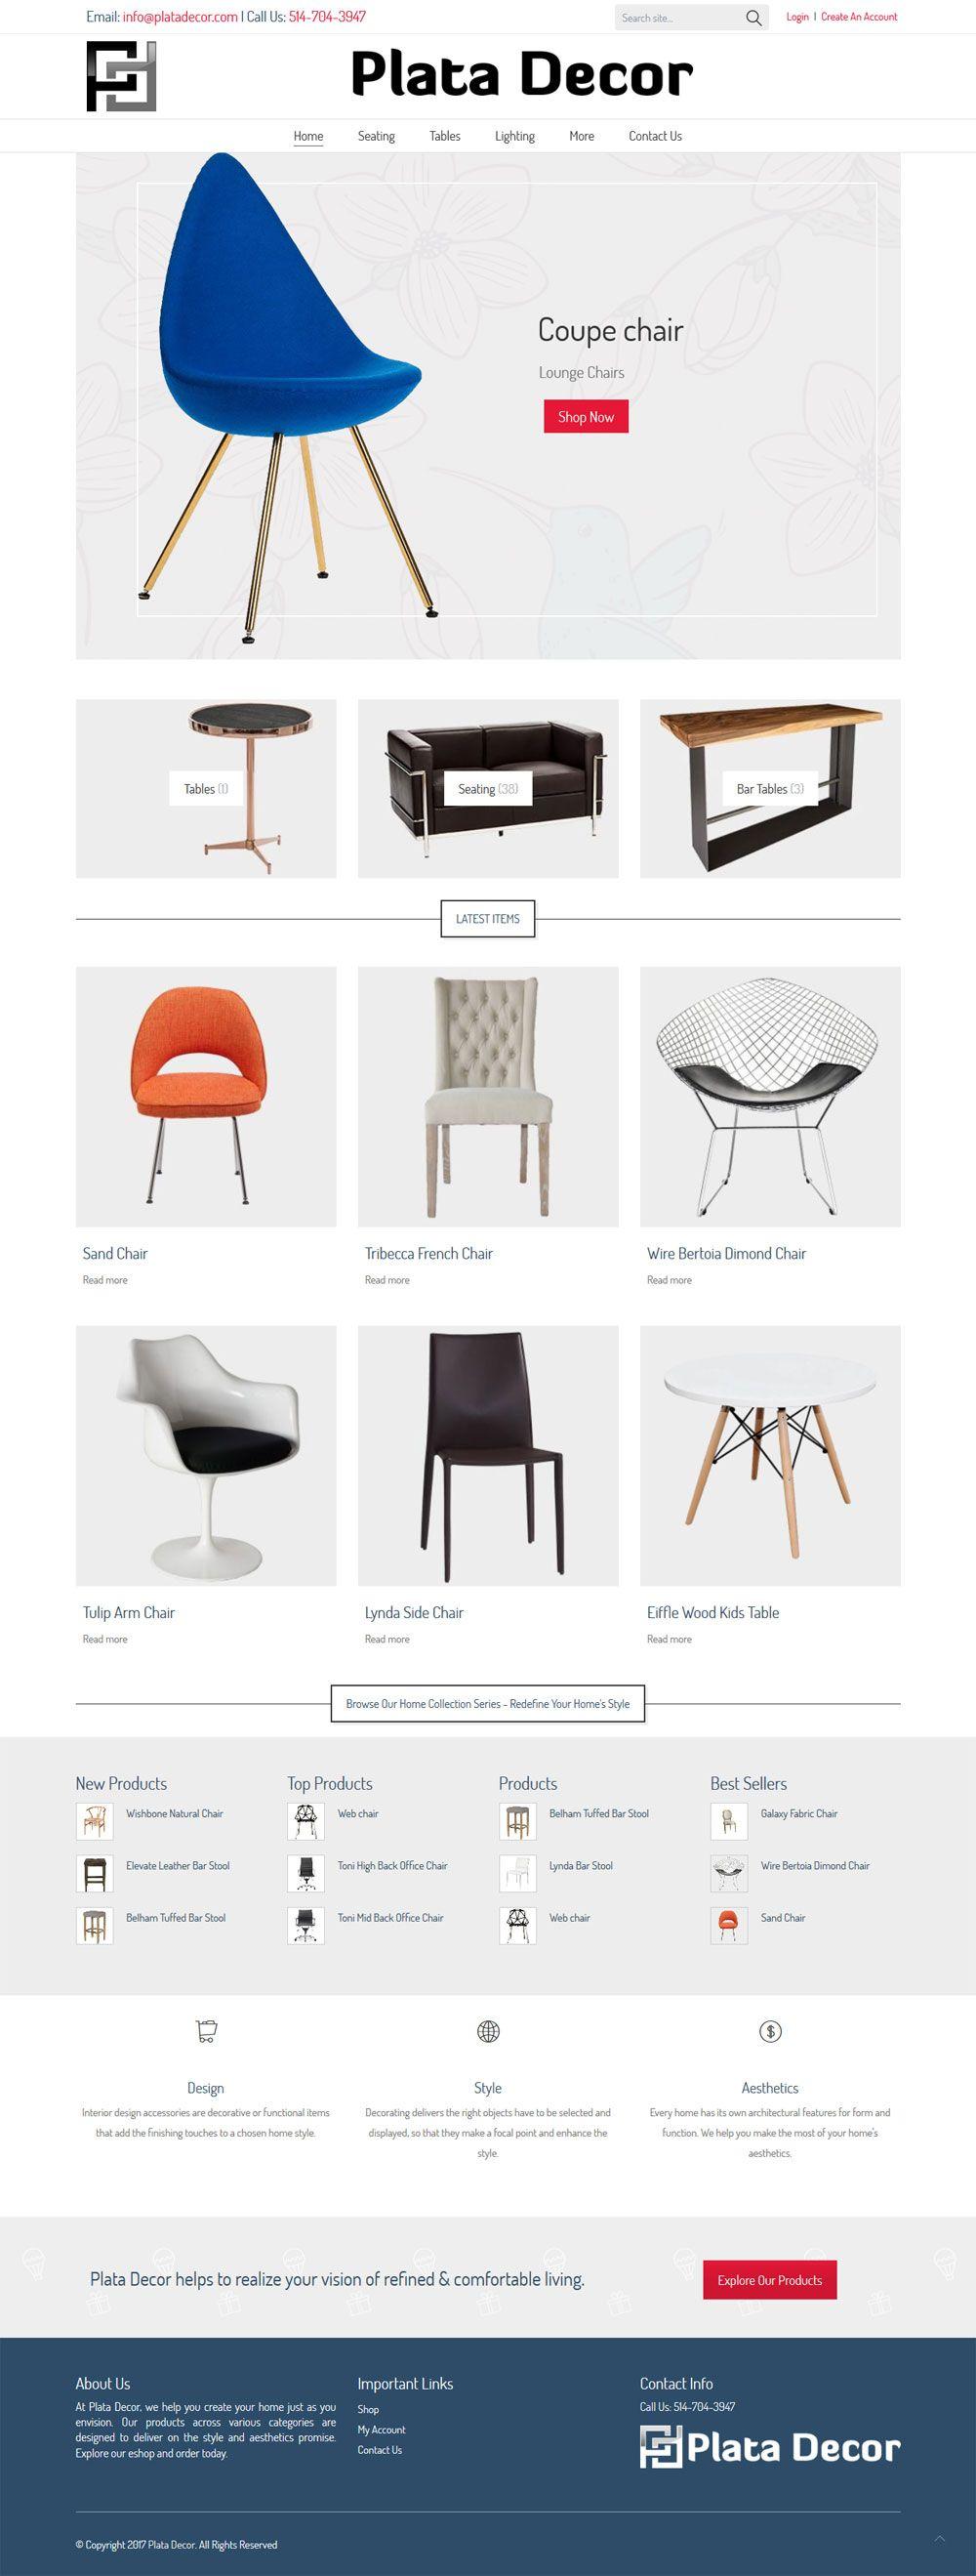 Get OnlineStore website in 999 mississauga